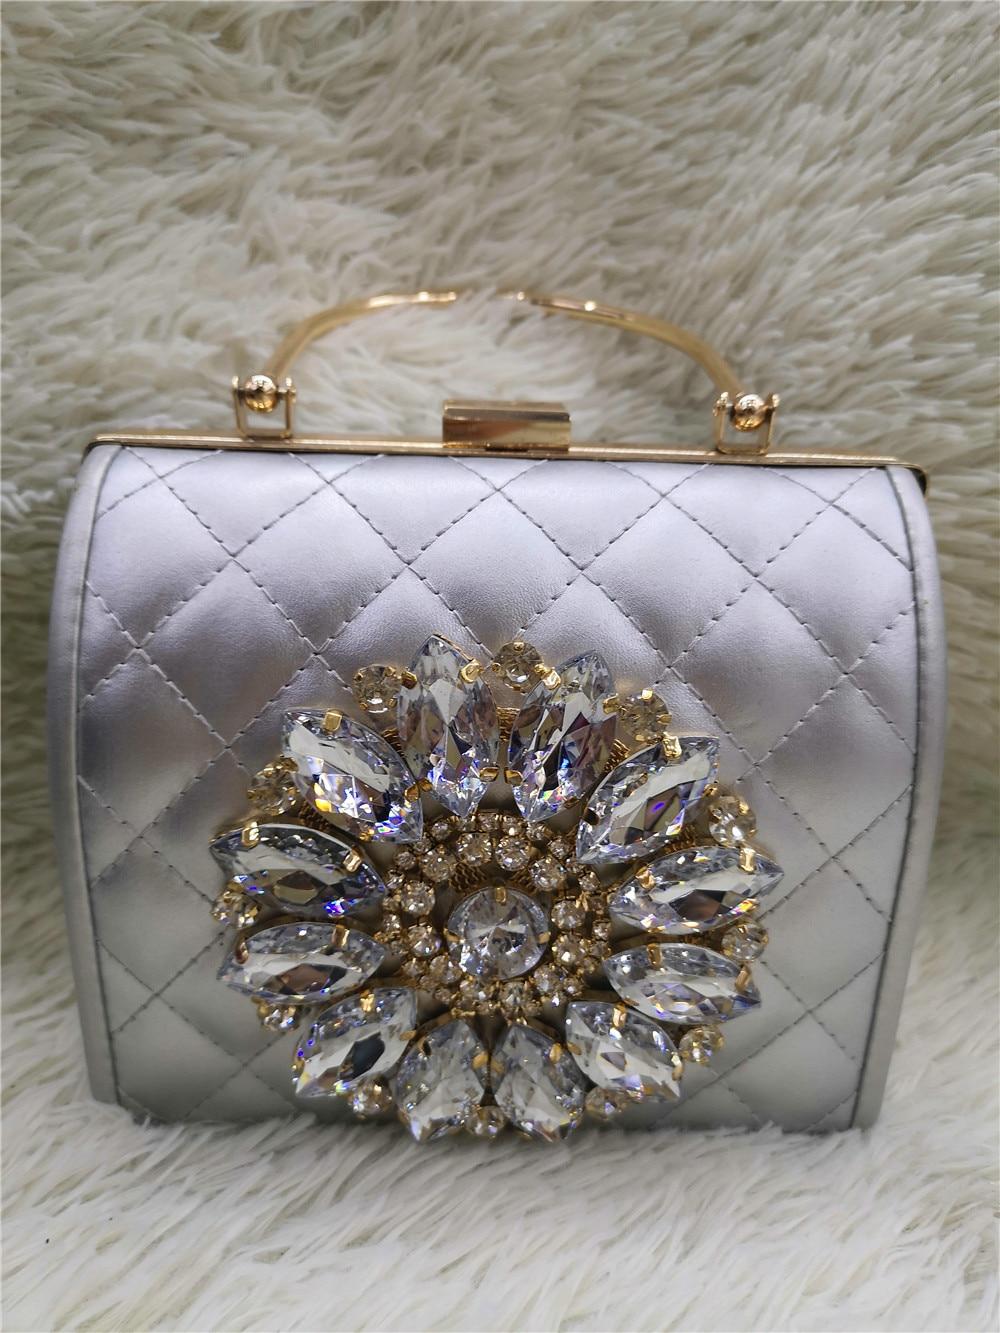 Chaliwini Clutch Bag Ladies Clutch Purses Bridal Evening Crystal Summer Bags For Women 2019 Luxury Small Cross Body Bags